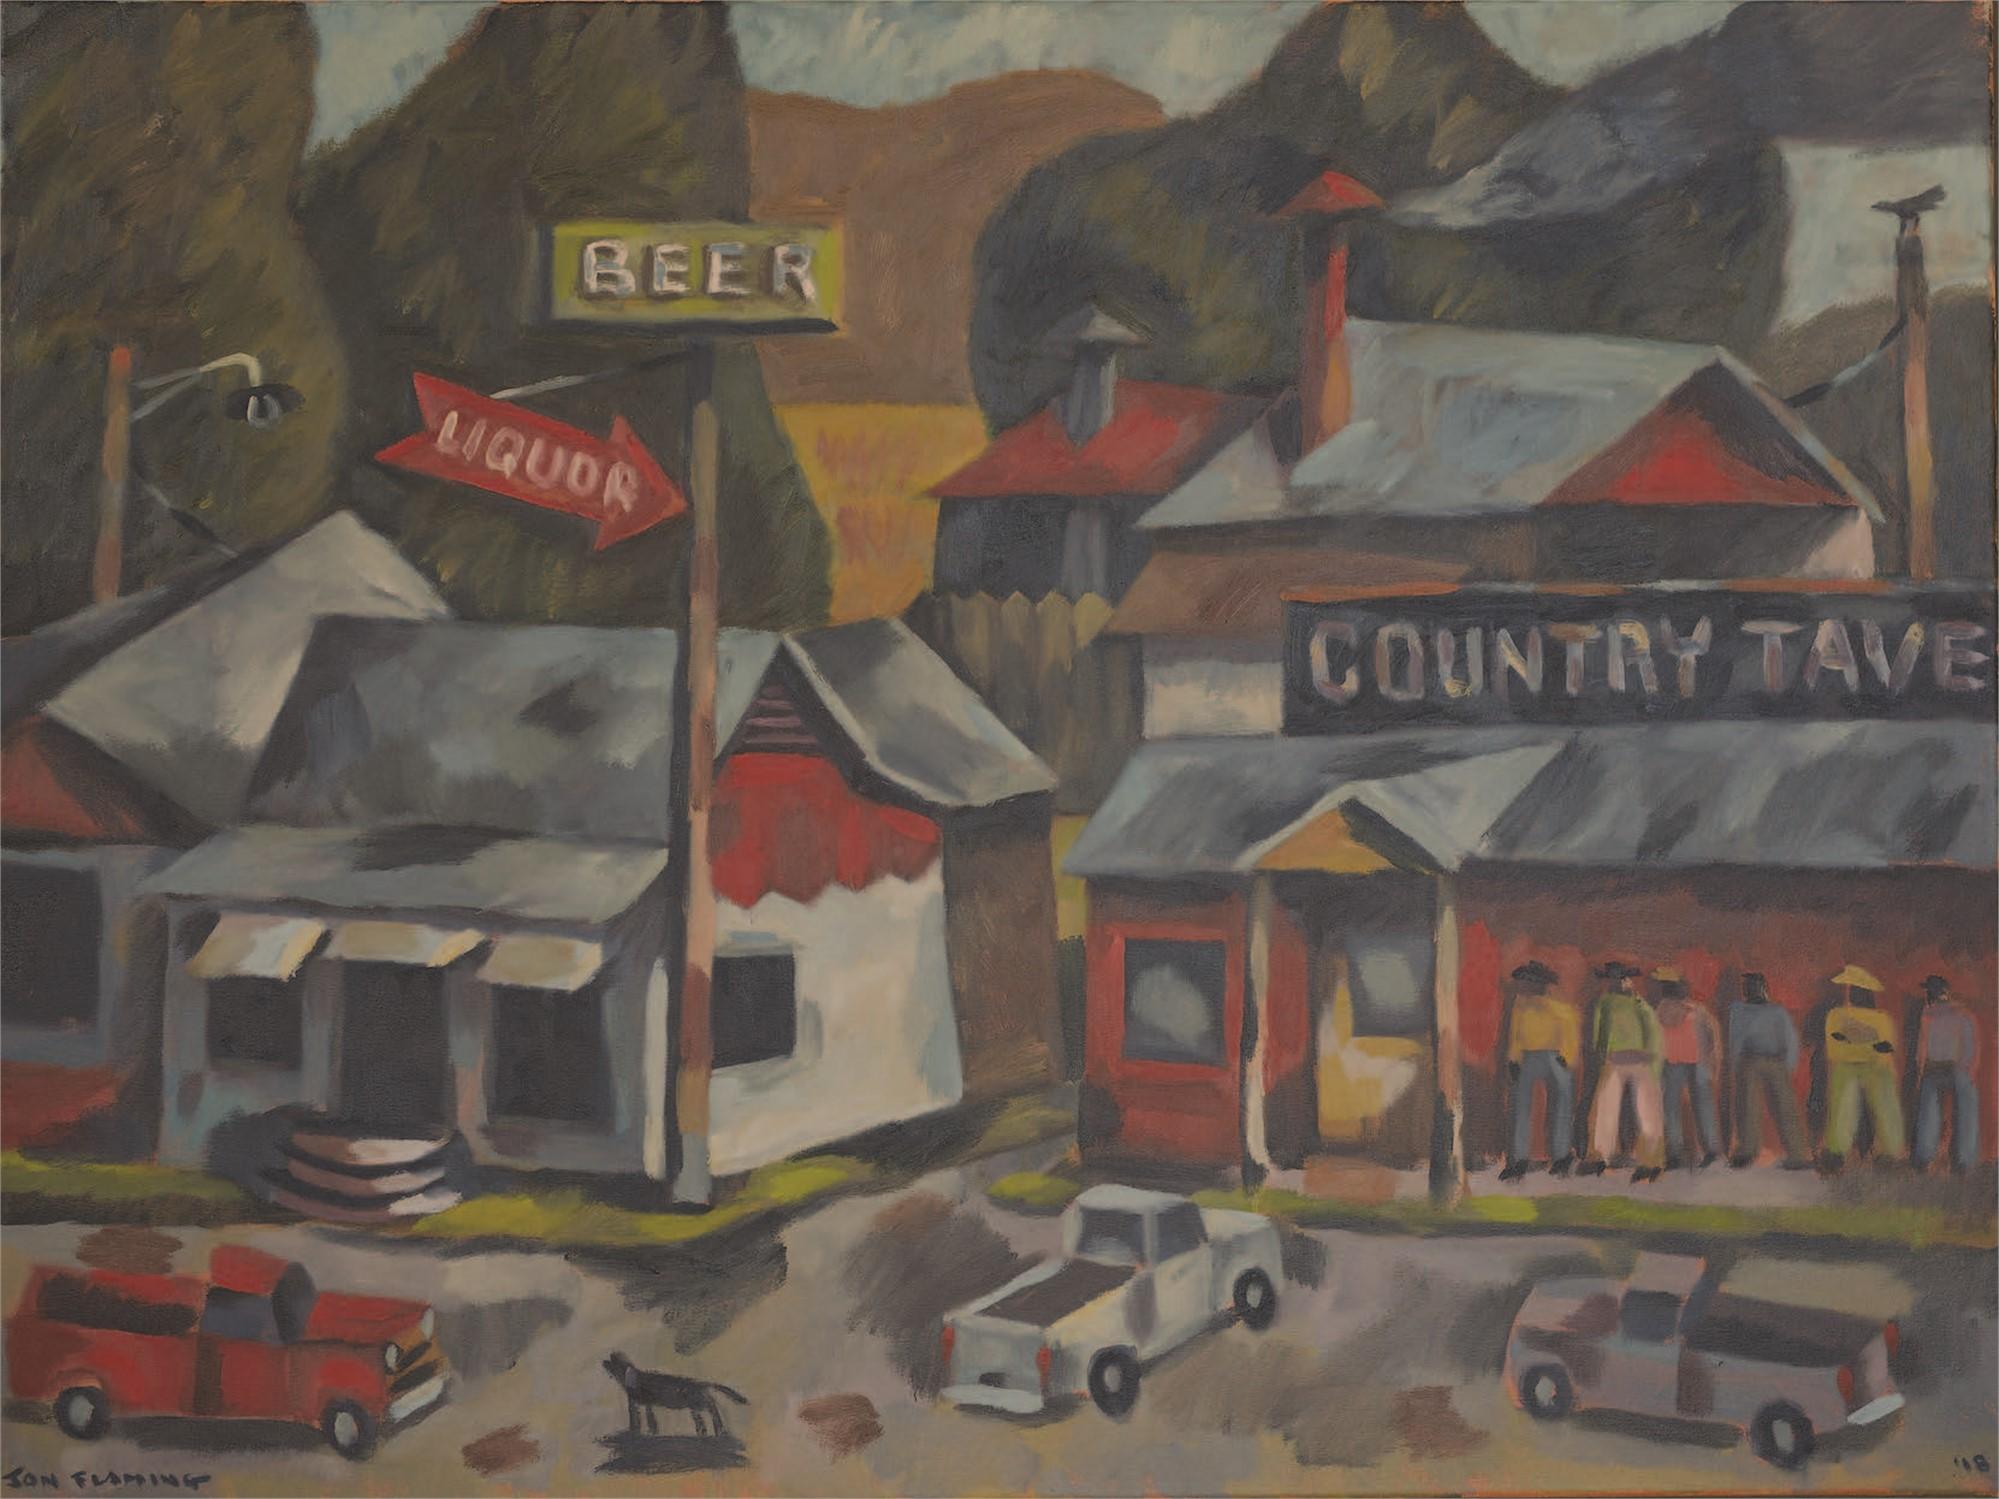 Country Tavern BBQ, Kilgore, Texas by Jon Flaming